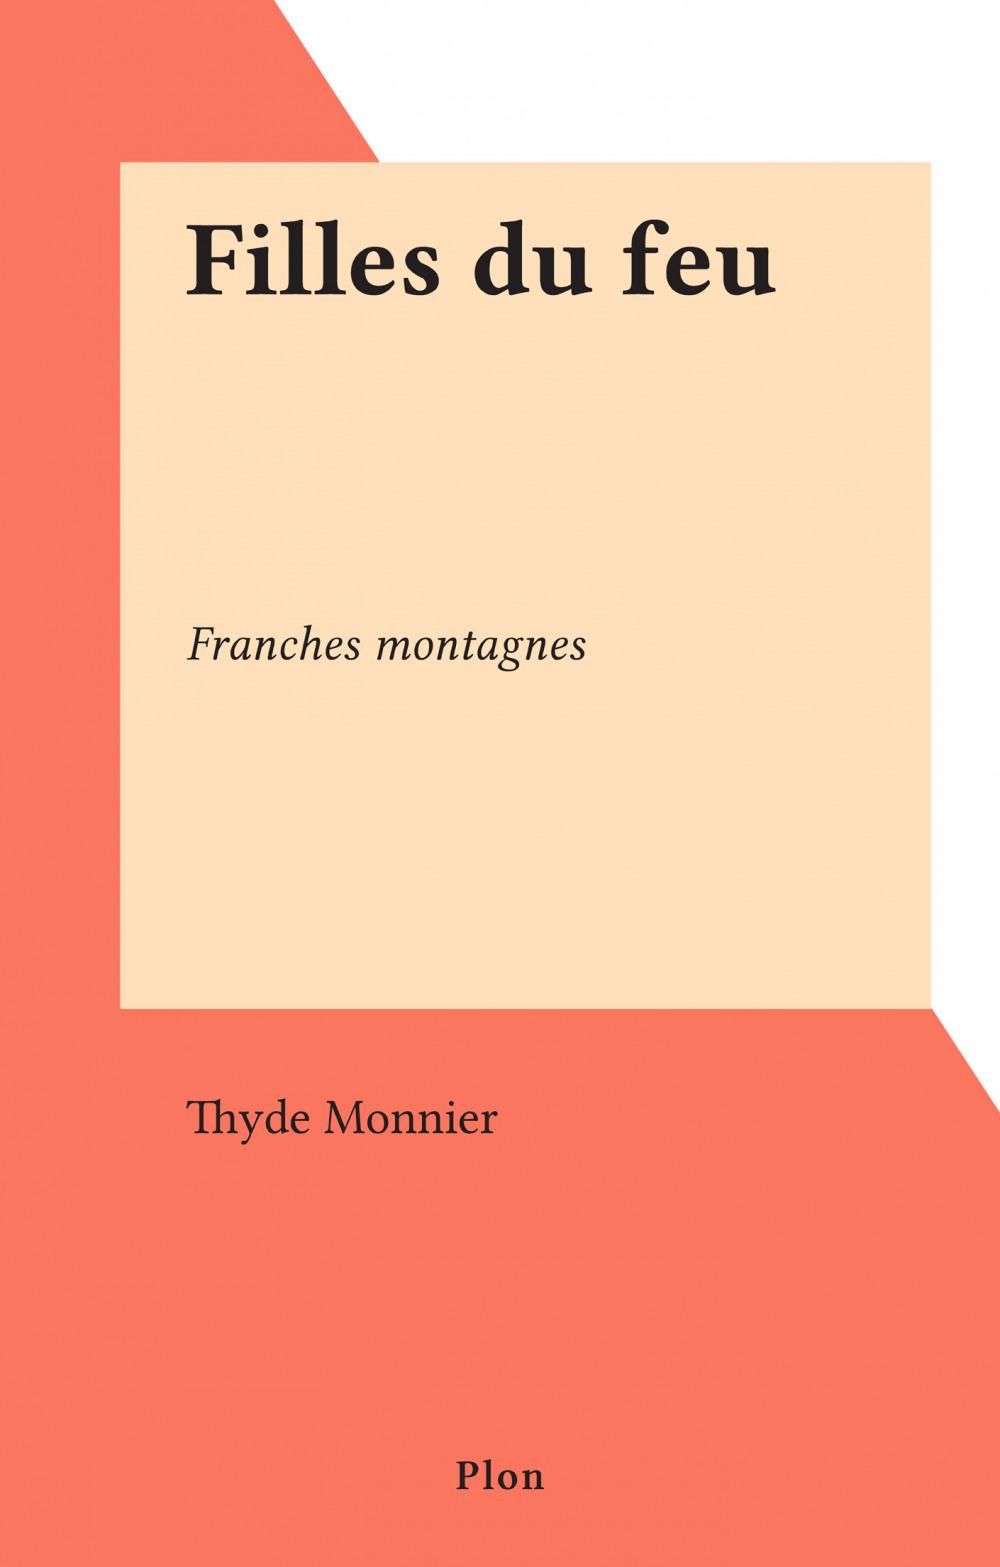 Filles du feu  - Thyde Monnier